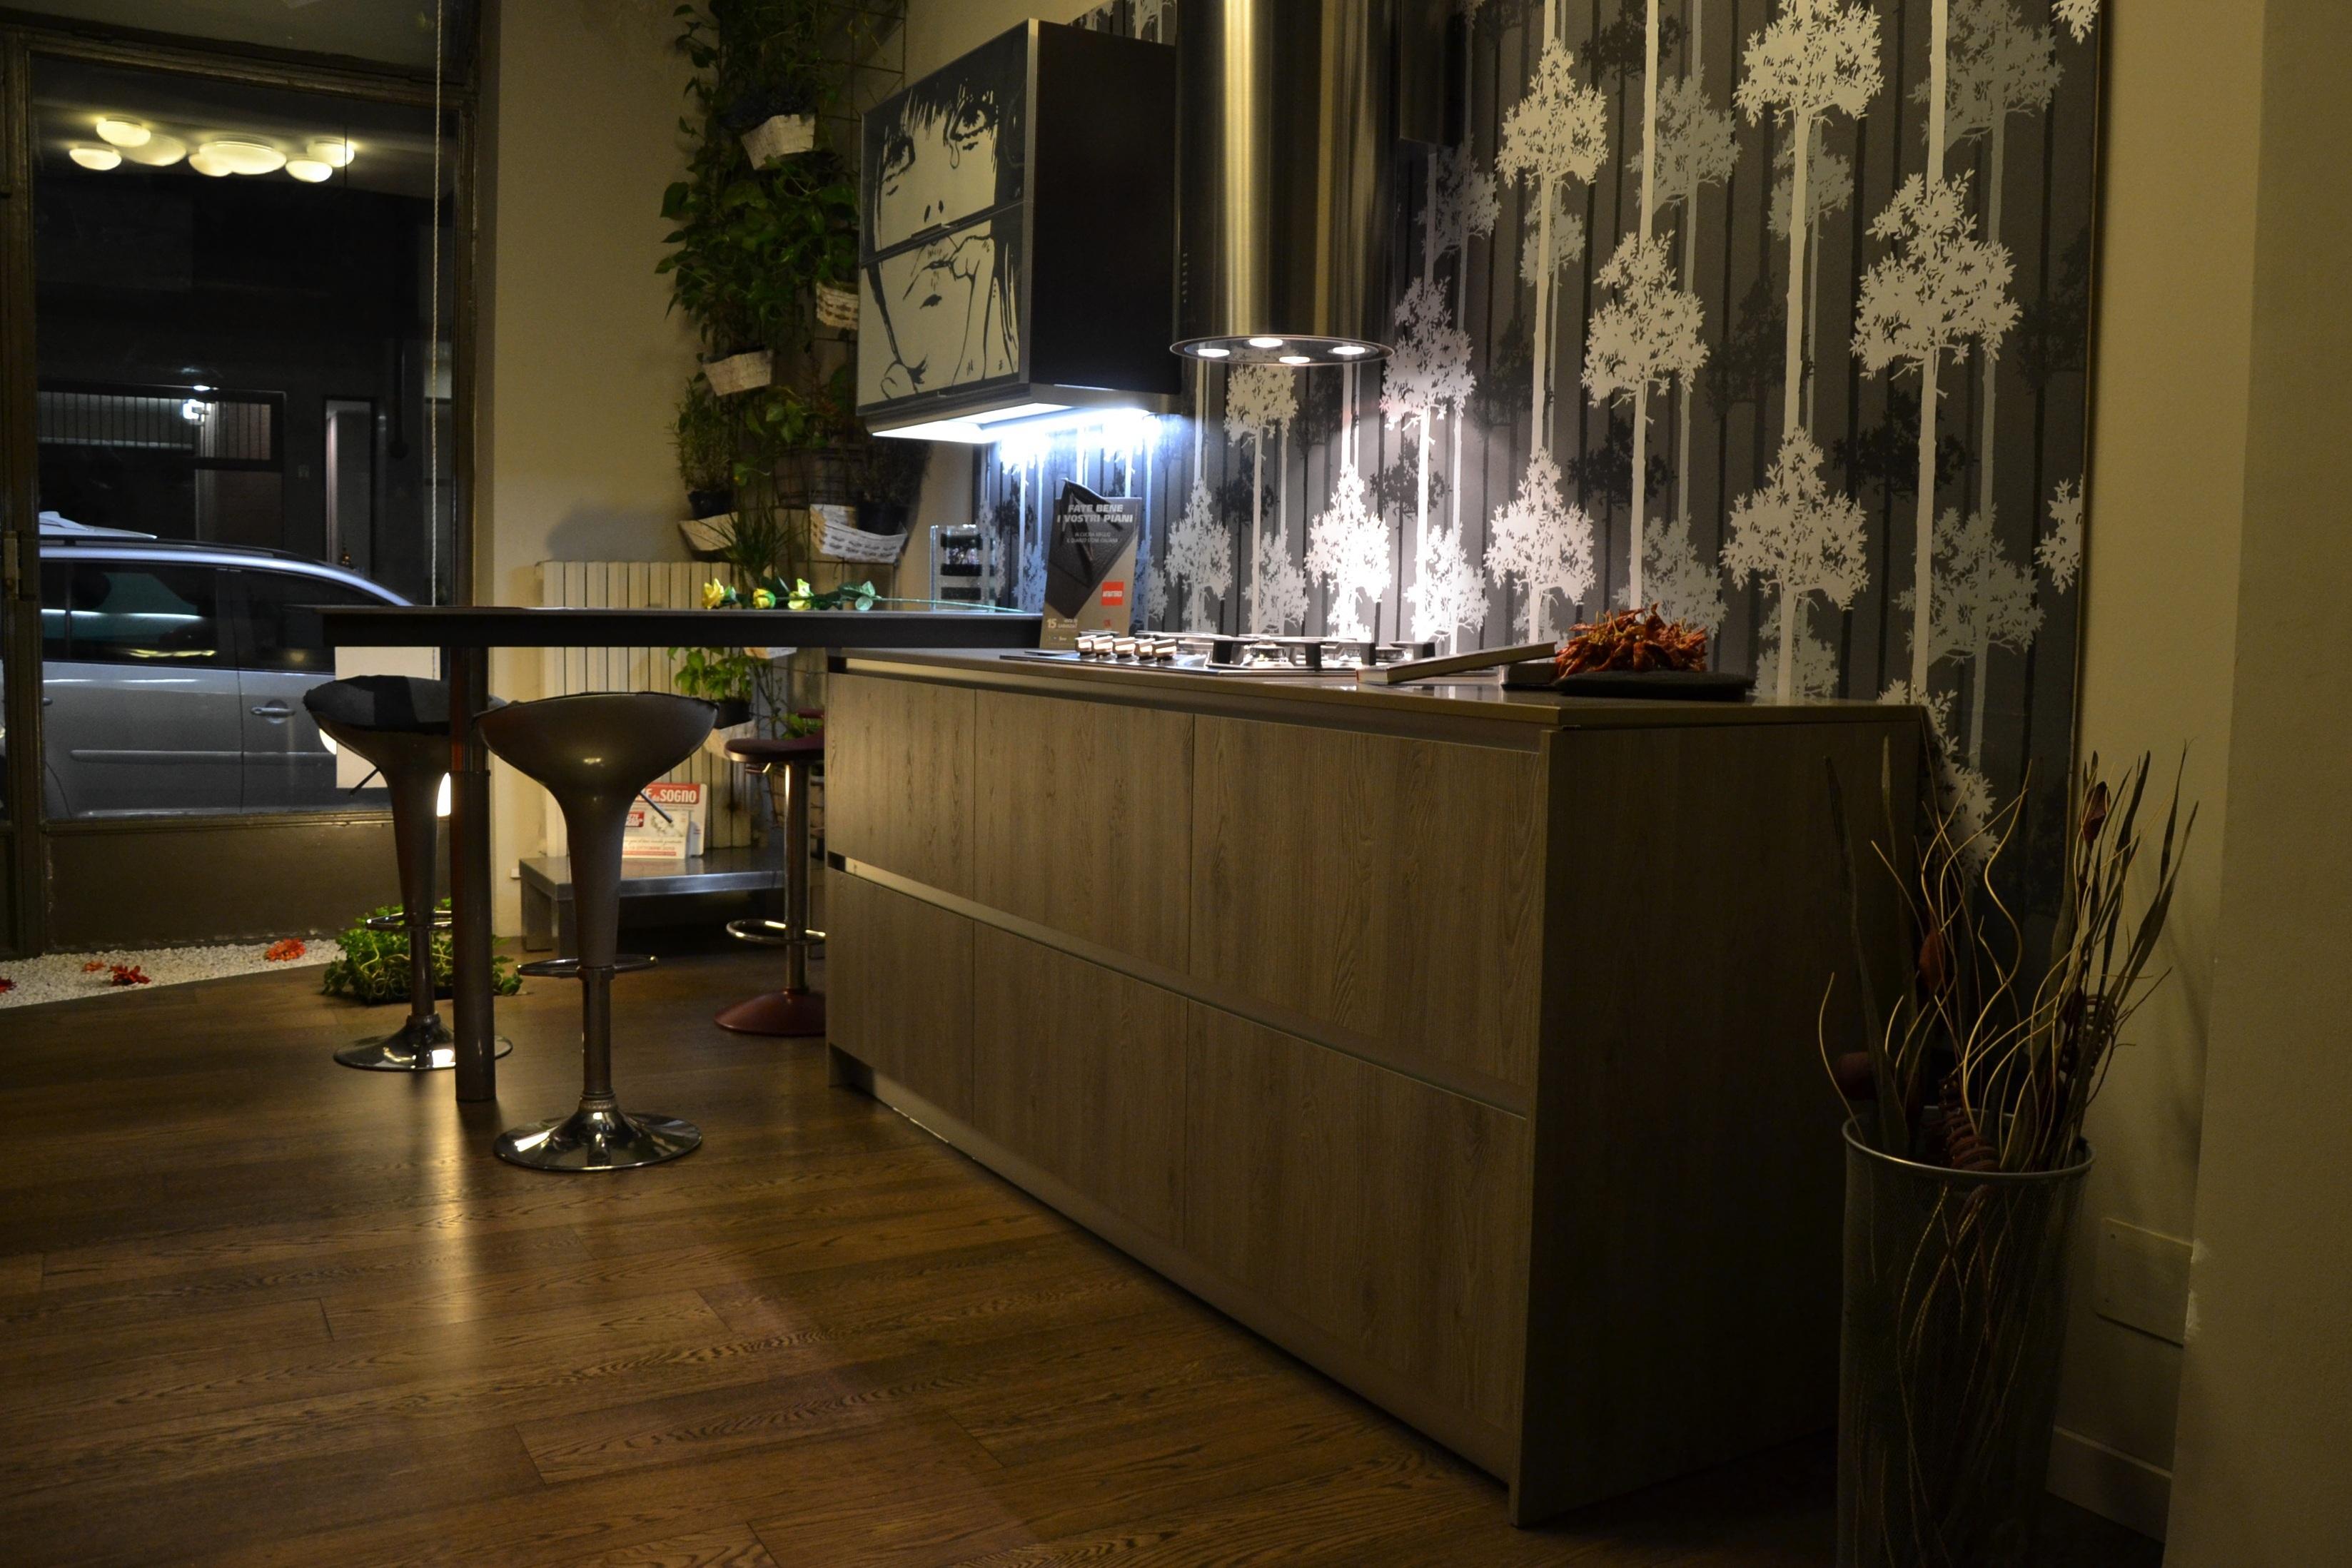 Il primo atelier doimo cucine aifaicasa - Doimo cucine torino ...